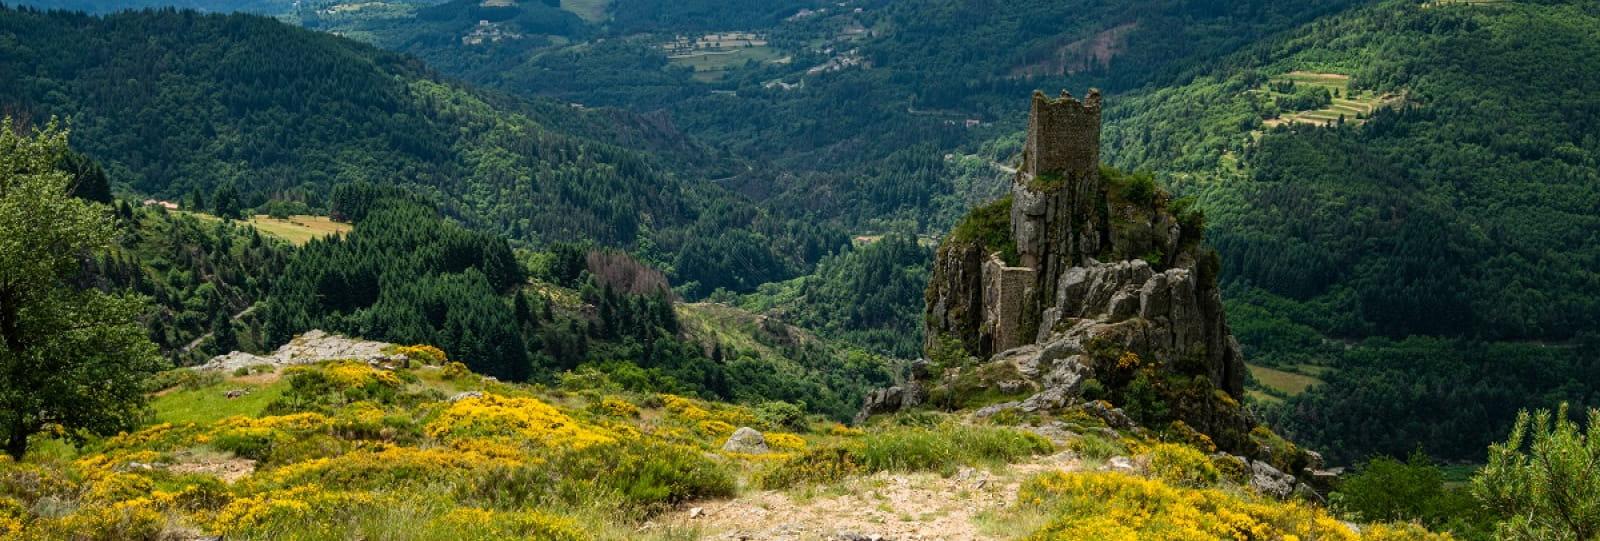 Equipement Emerveillés par l'Ardèche